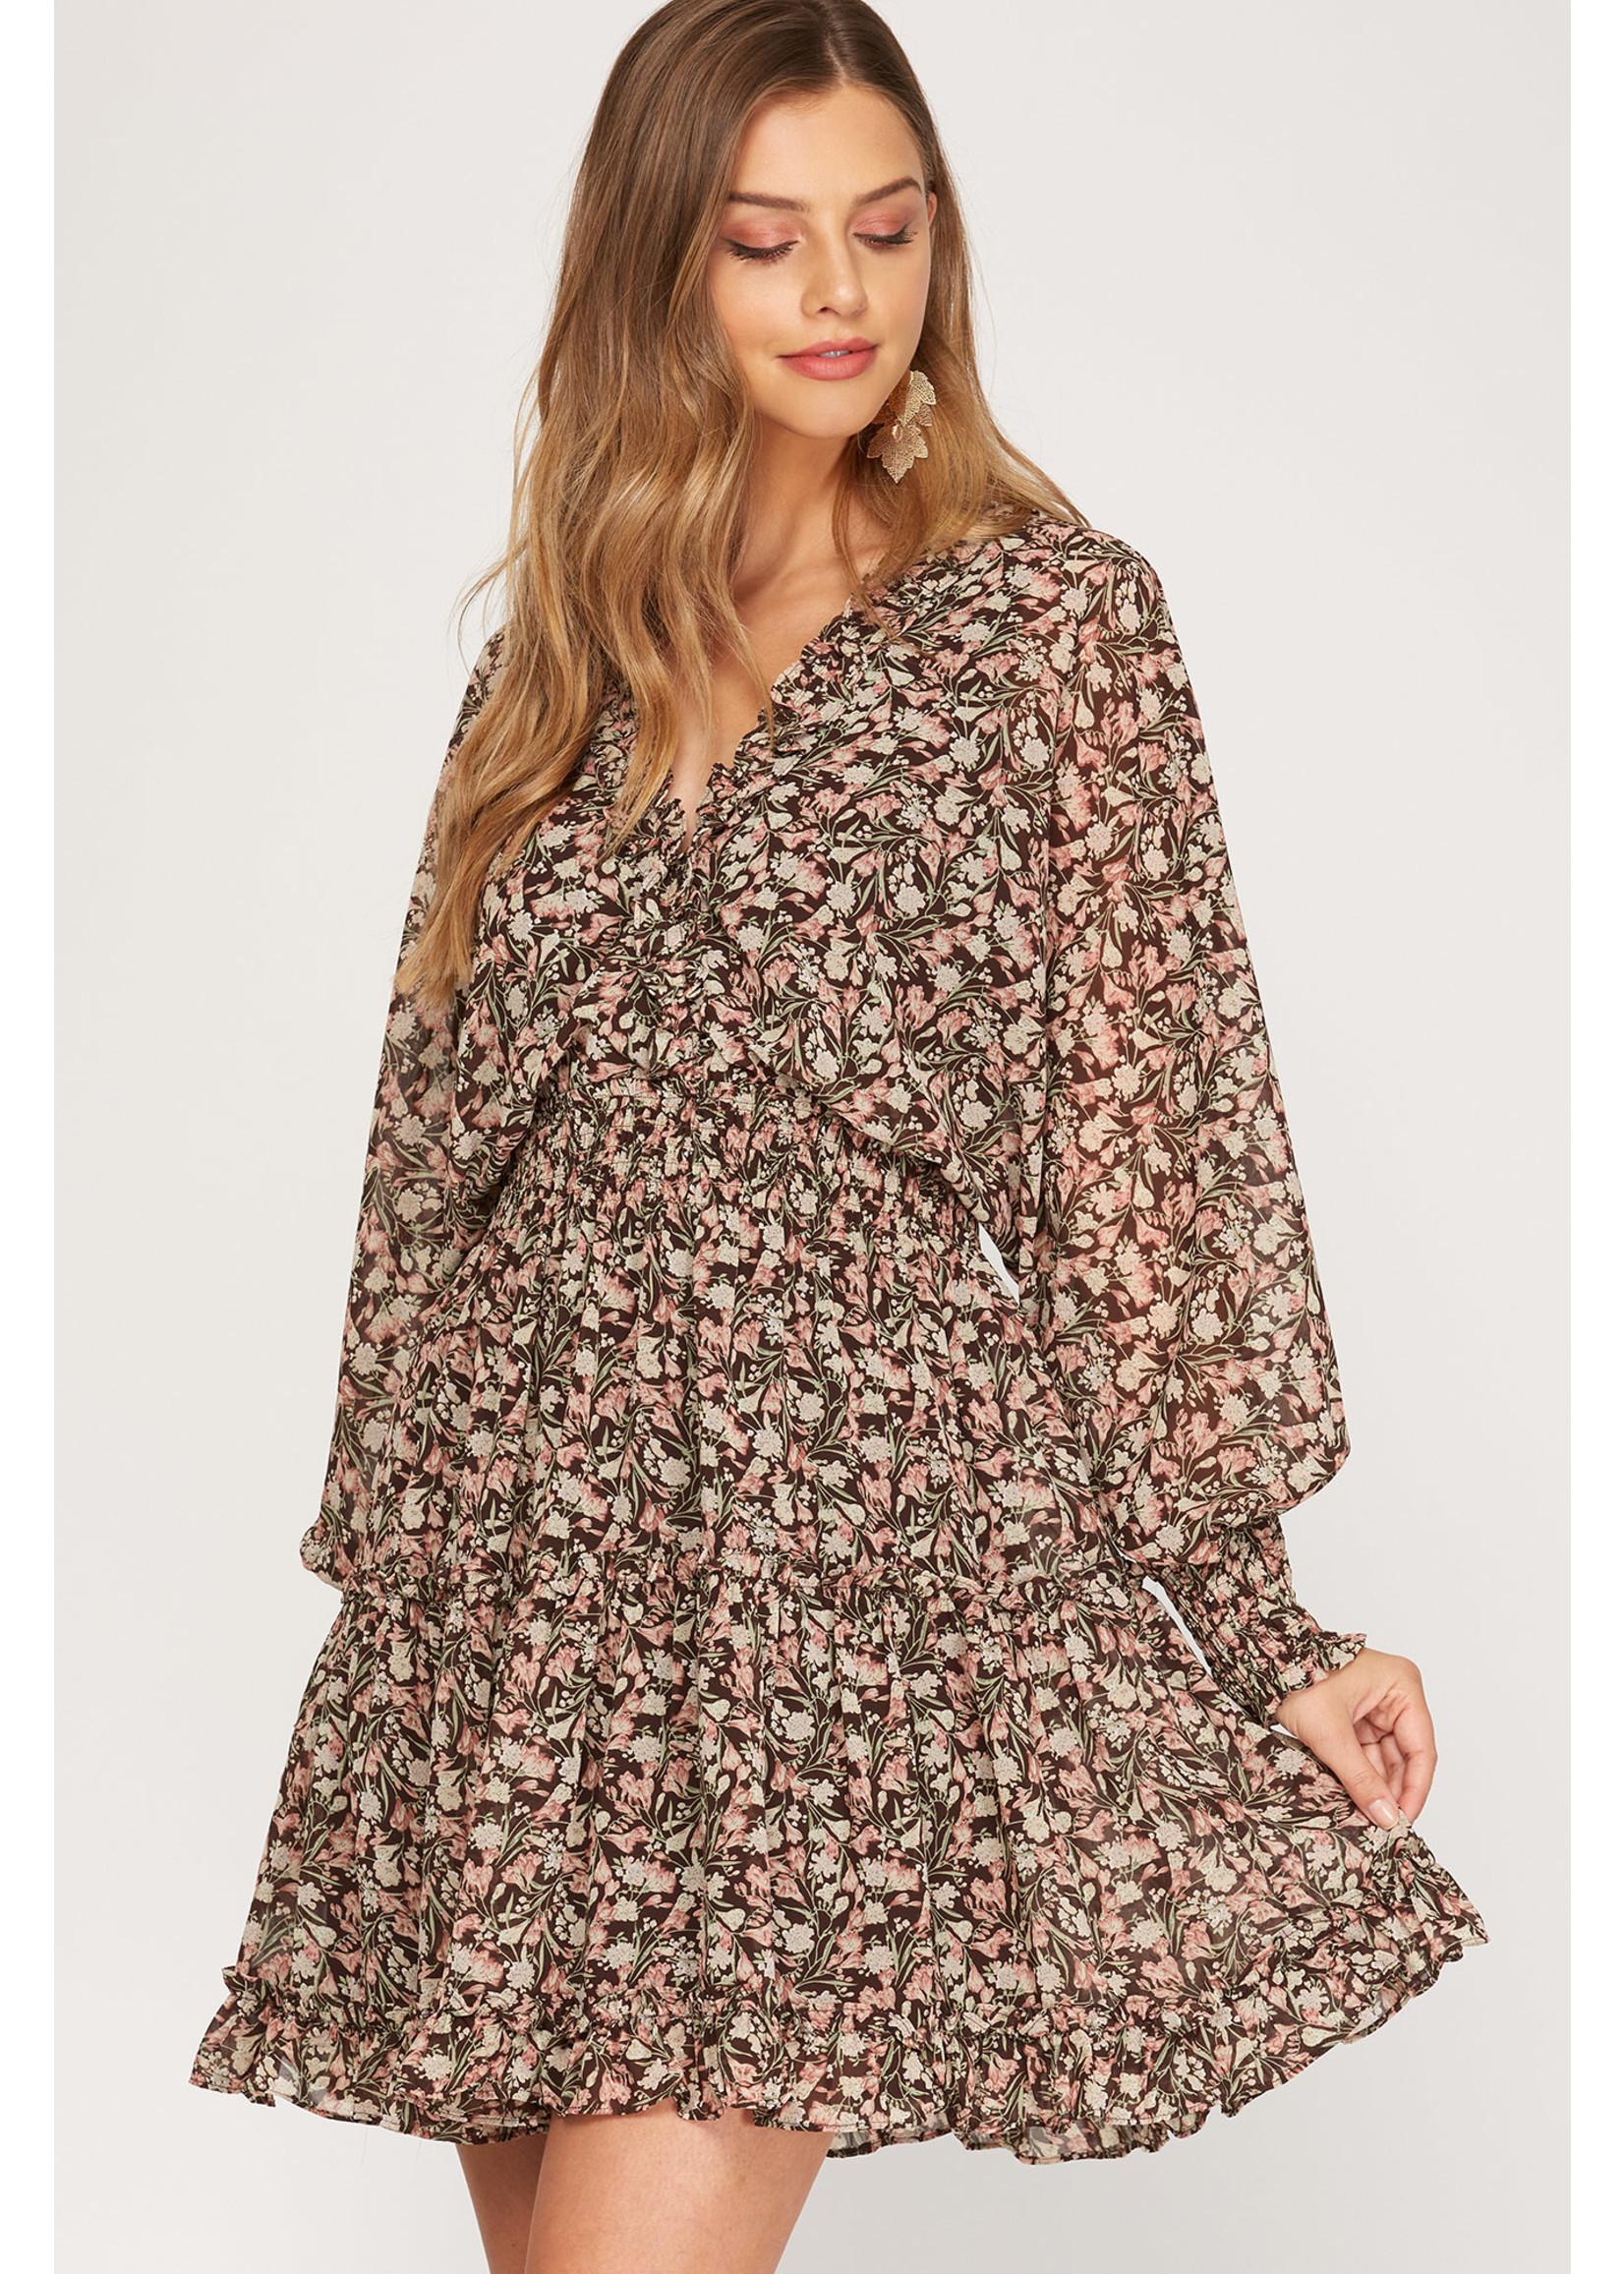 She & Sky Woven Dress